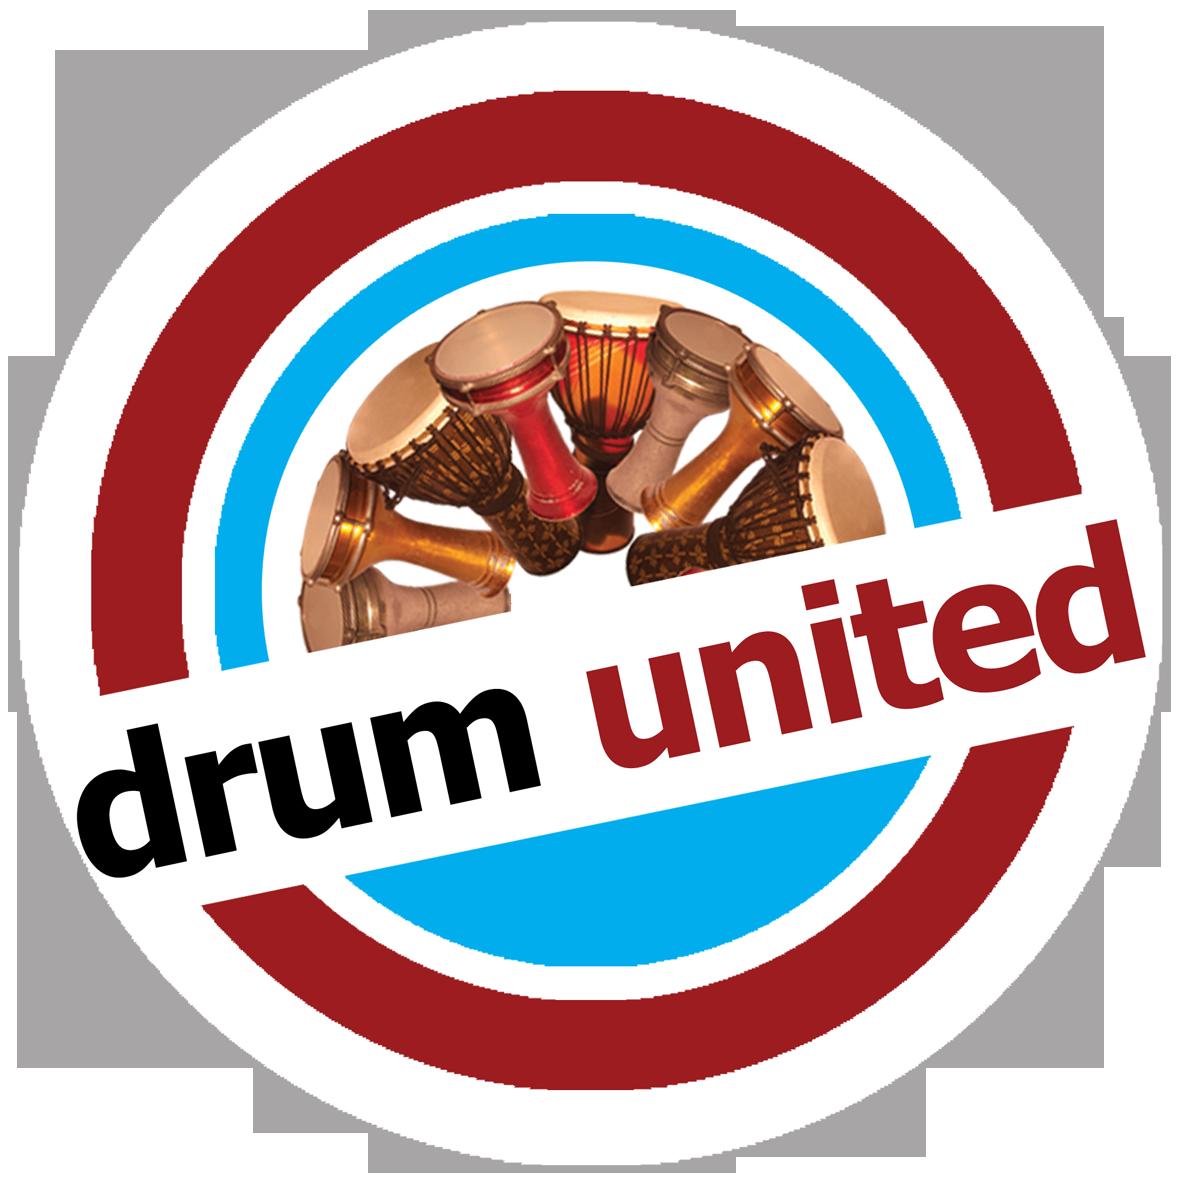 Drum United Circle Logo 13.png